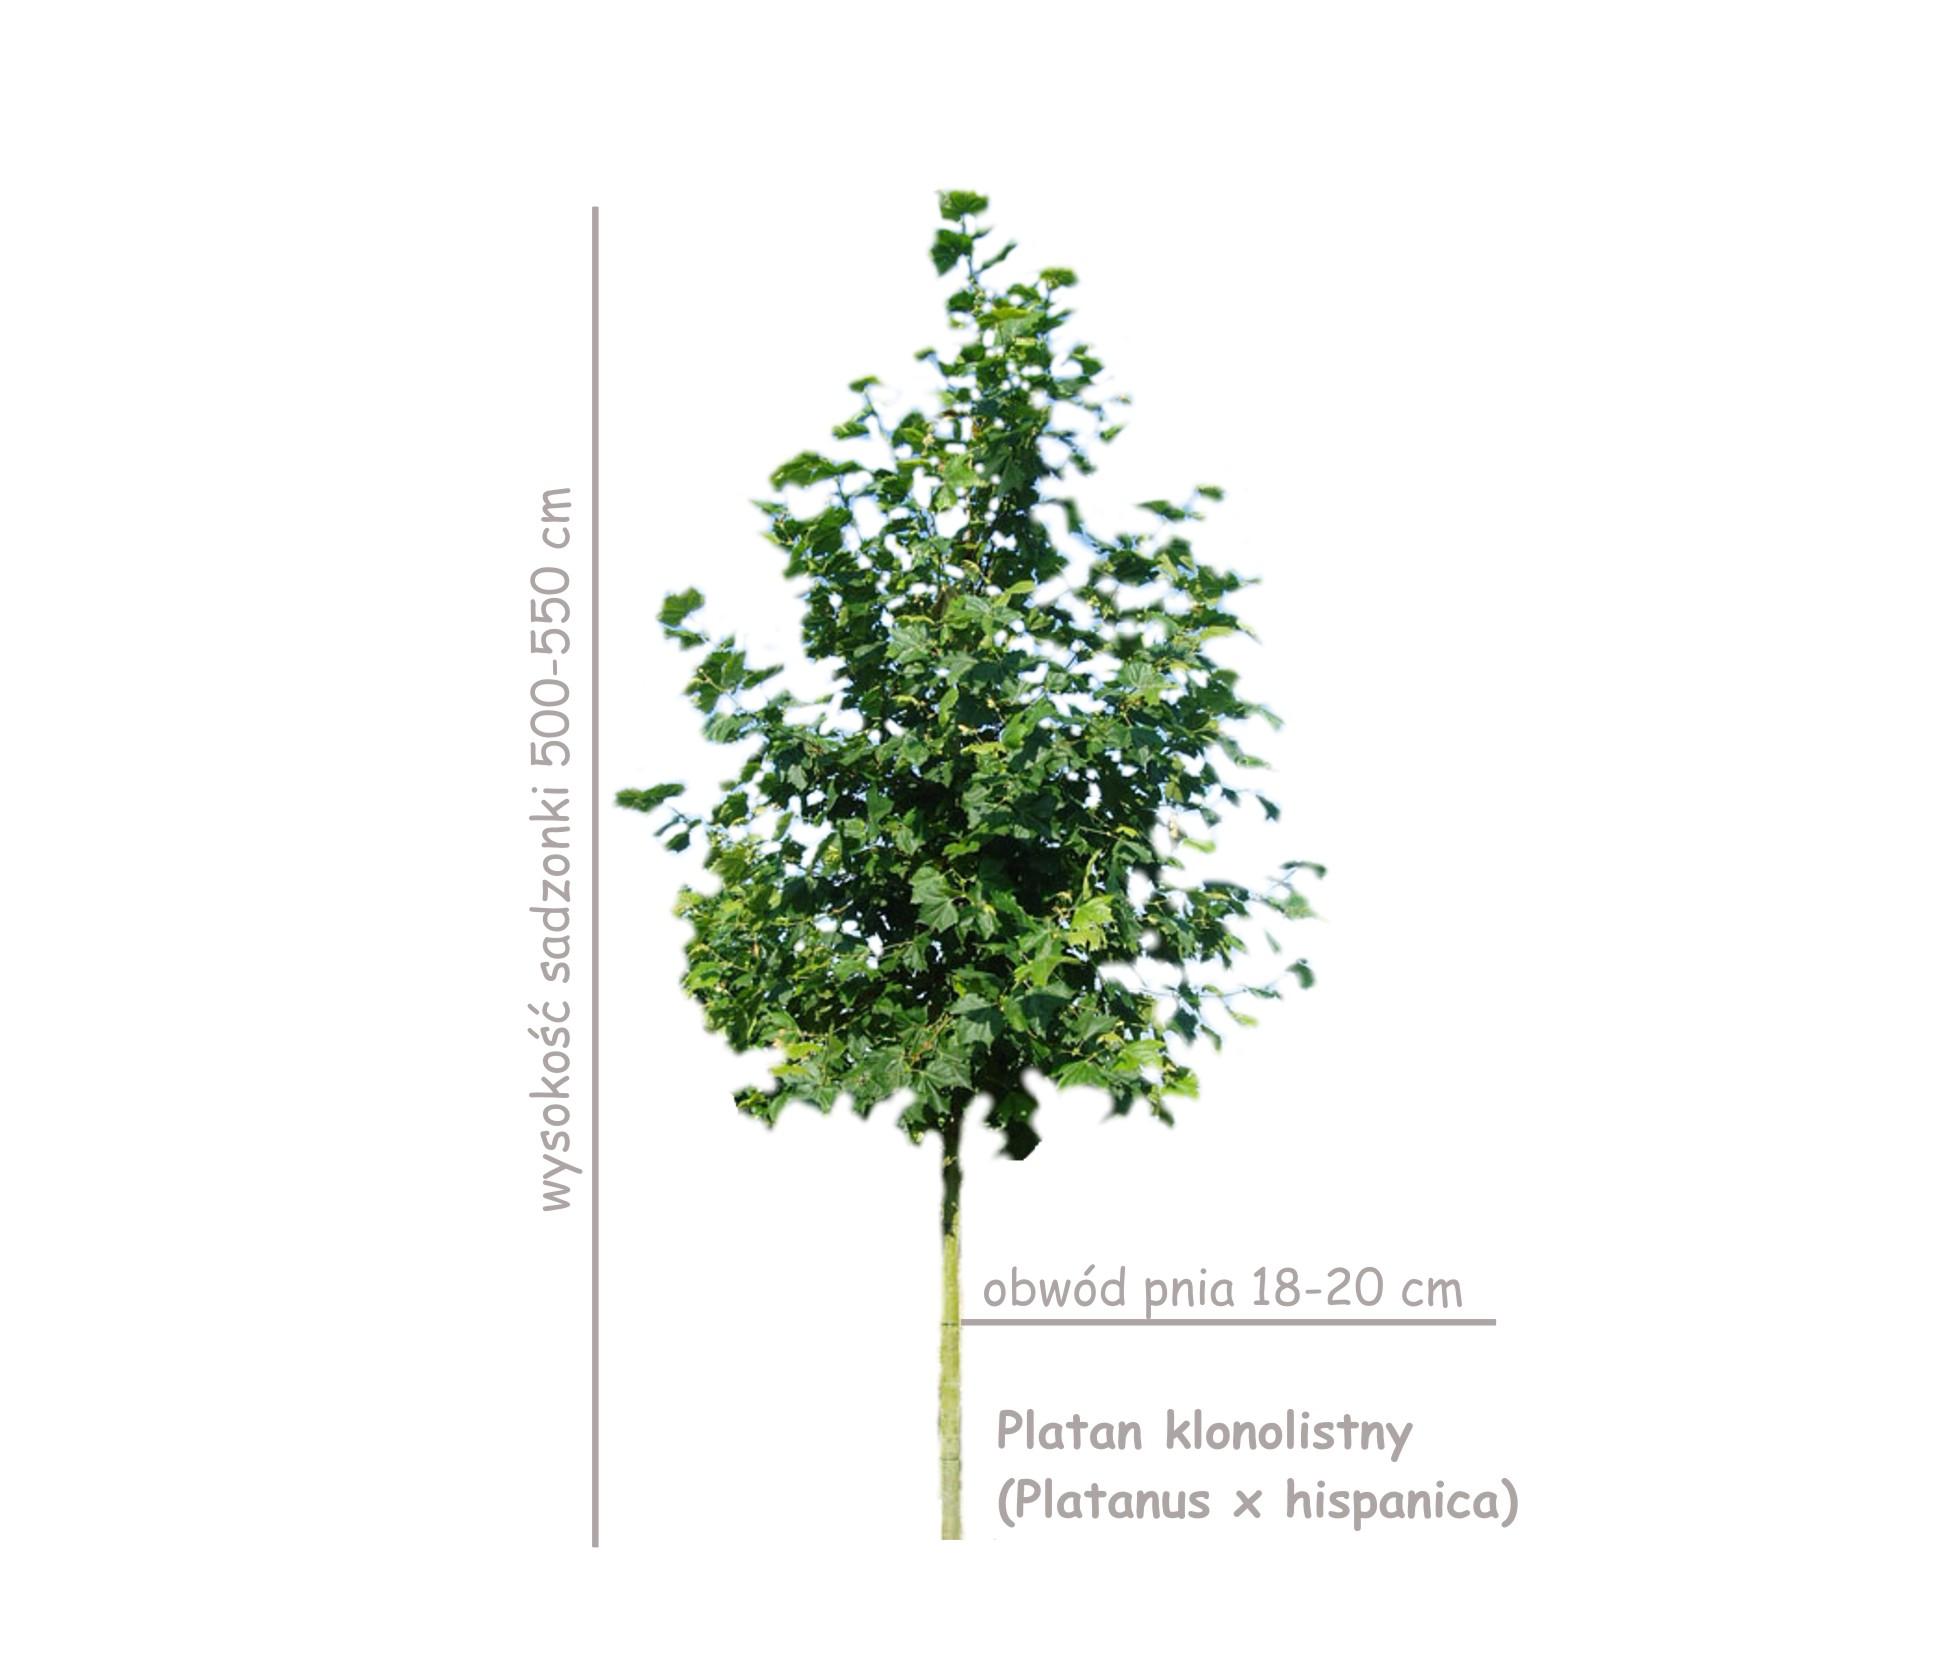 Platan klonolistny (Platanus x hispanica, acerifolia) sadzonki drzew